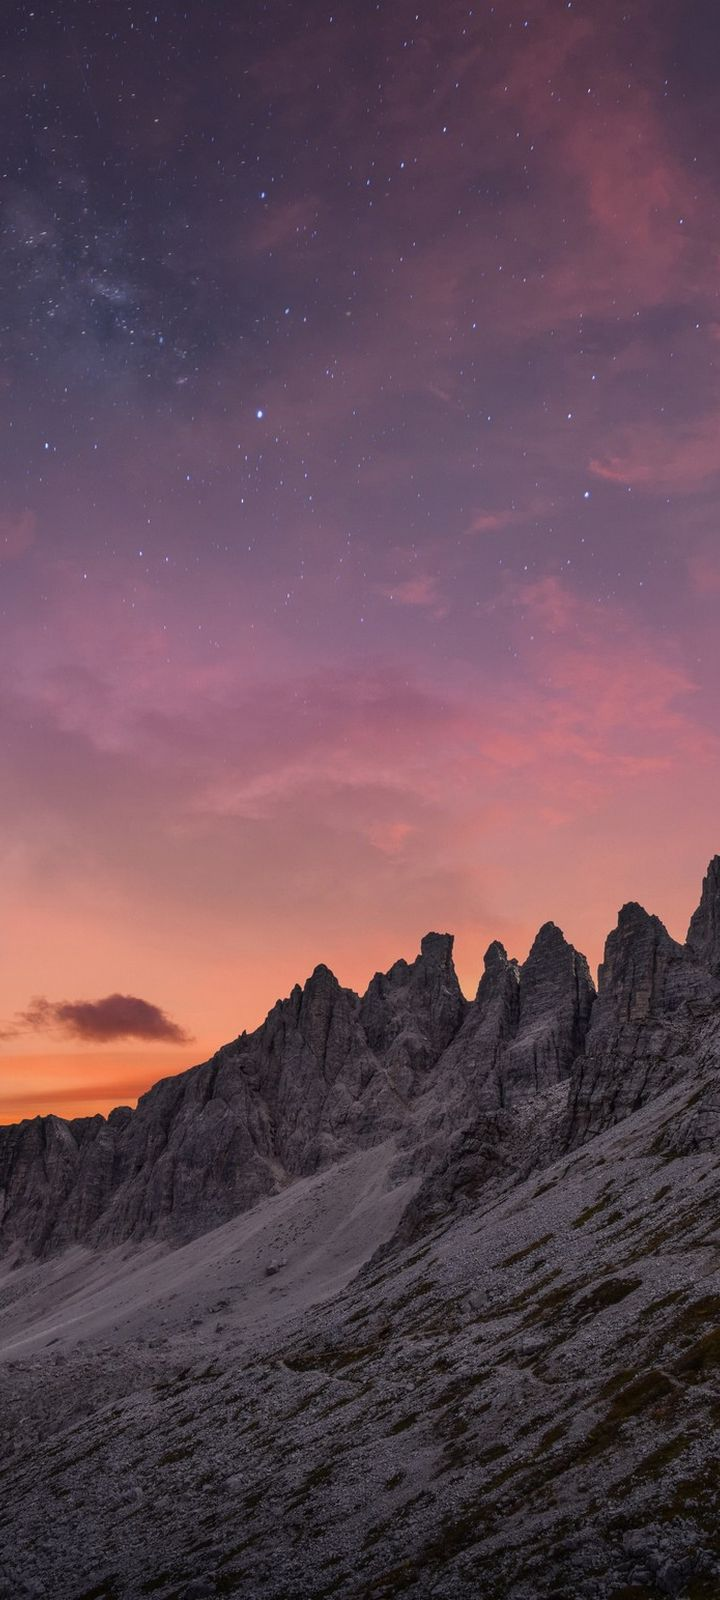 Mountains Mountain Range Landscape Wallpaper 720x1600